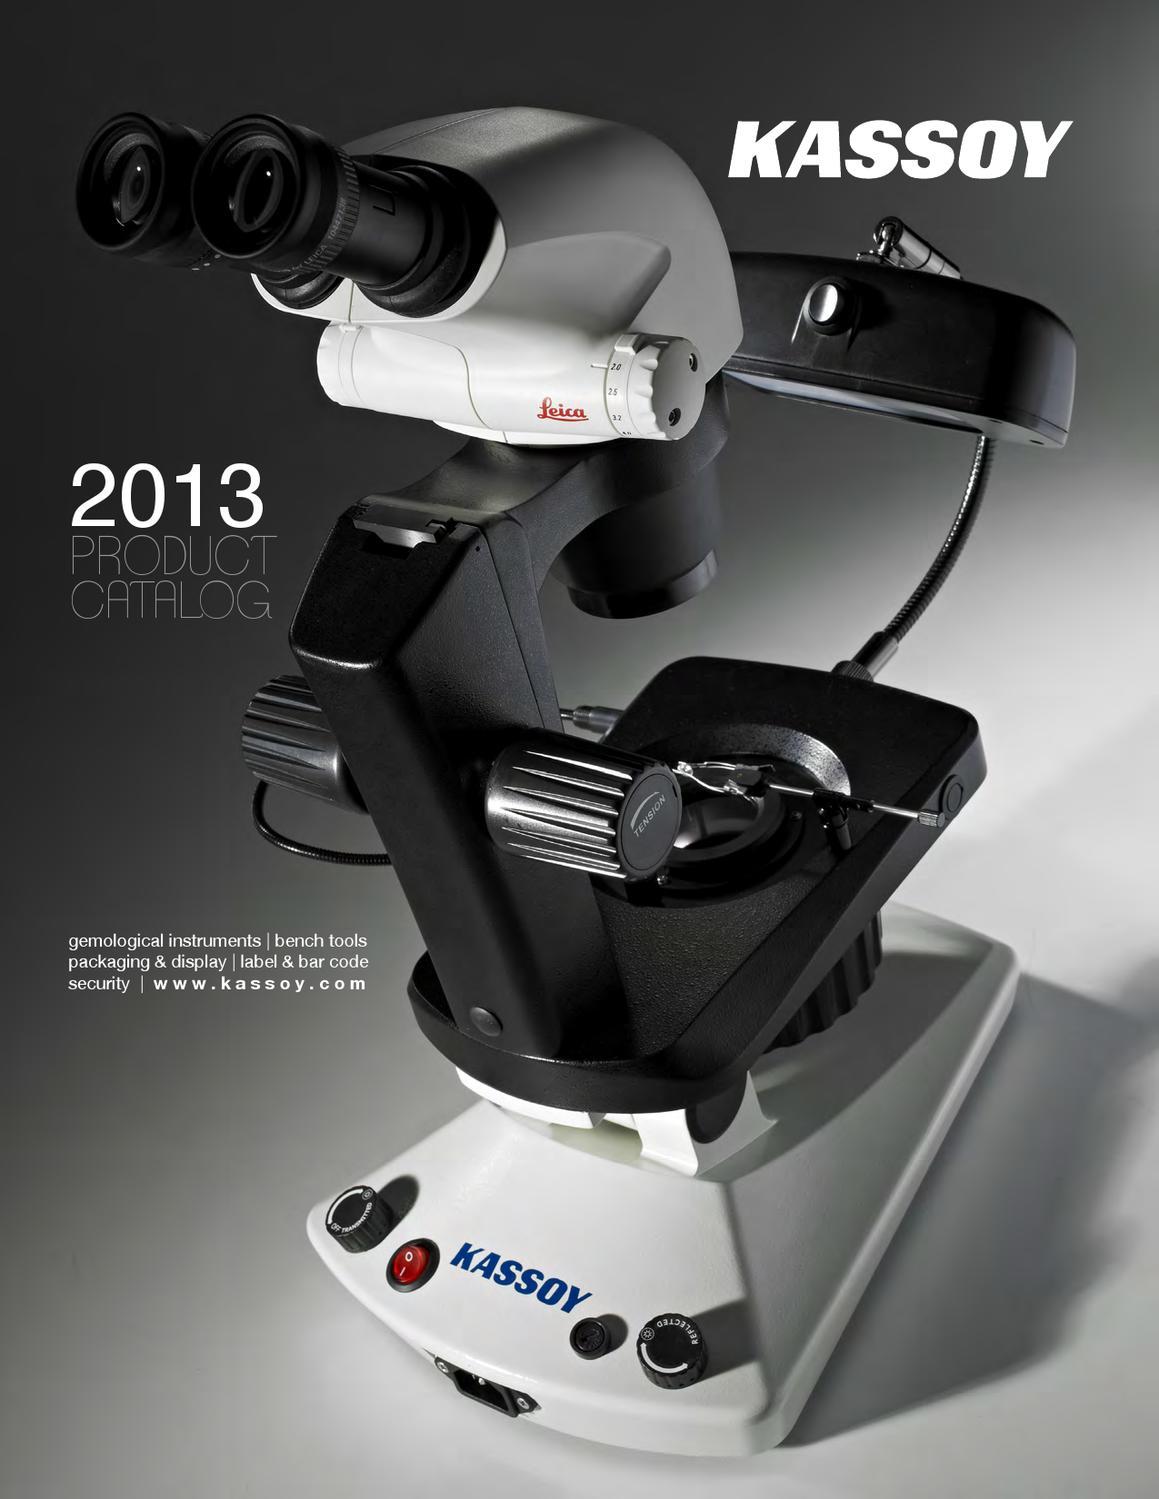 Kassoy 2013 Catalog by Kassoy, LLC - issuu